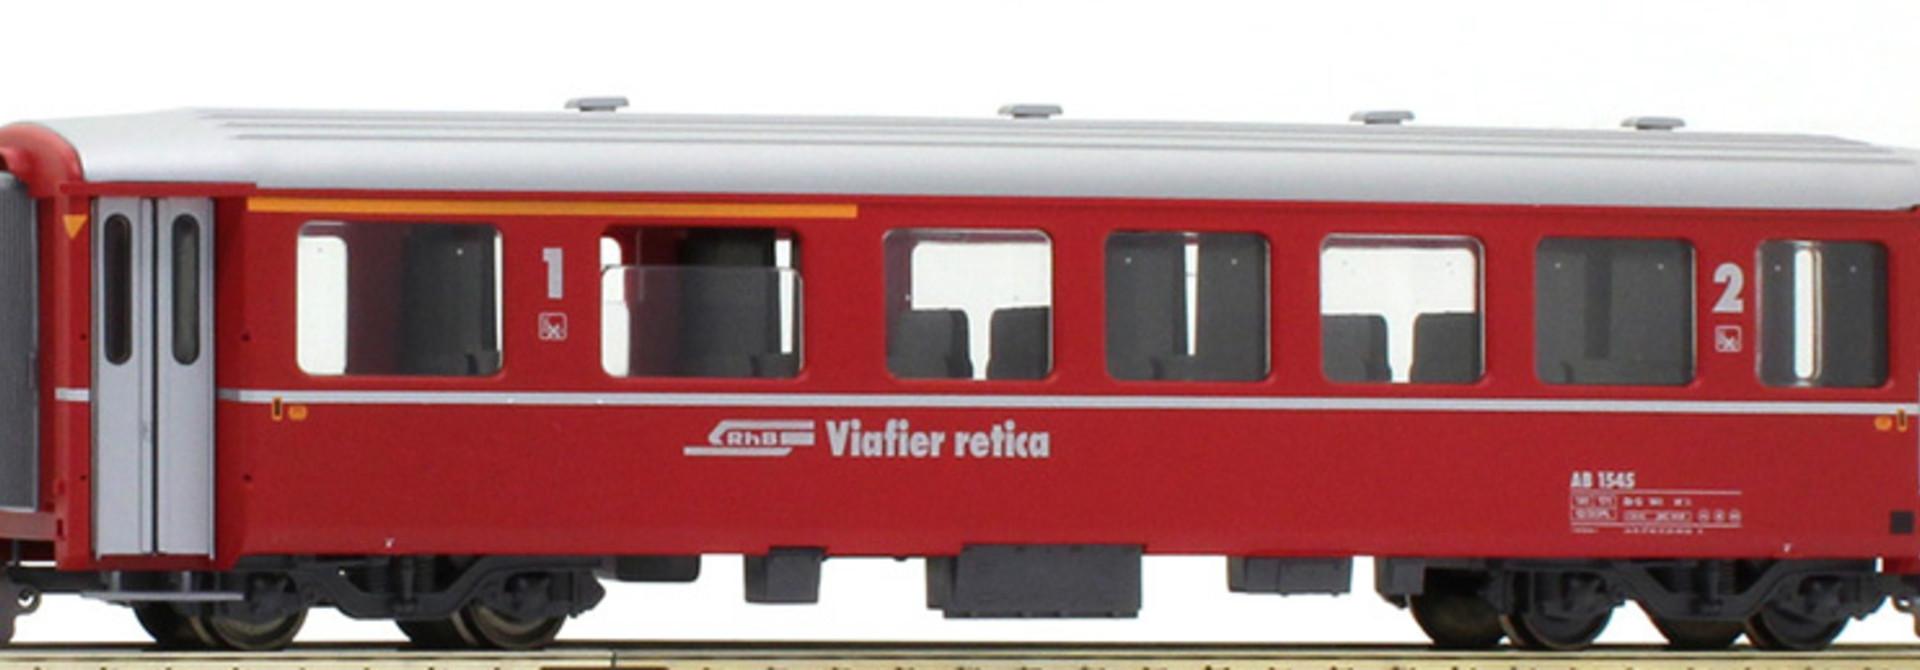 3256145 RhB AB 1545 Einheitswagen I Berninabahn